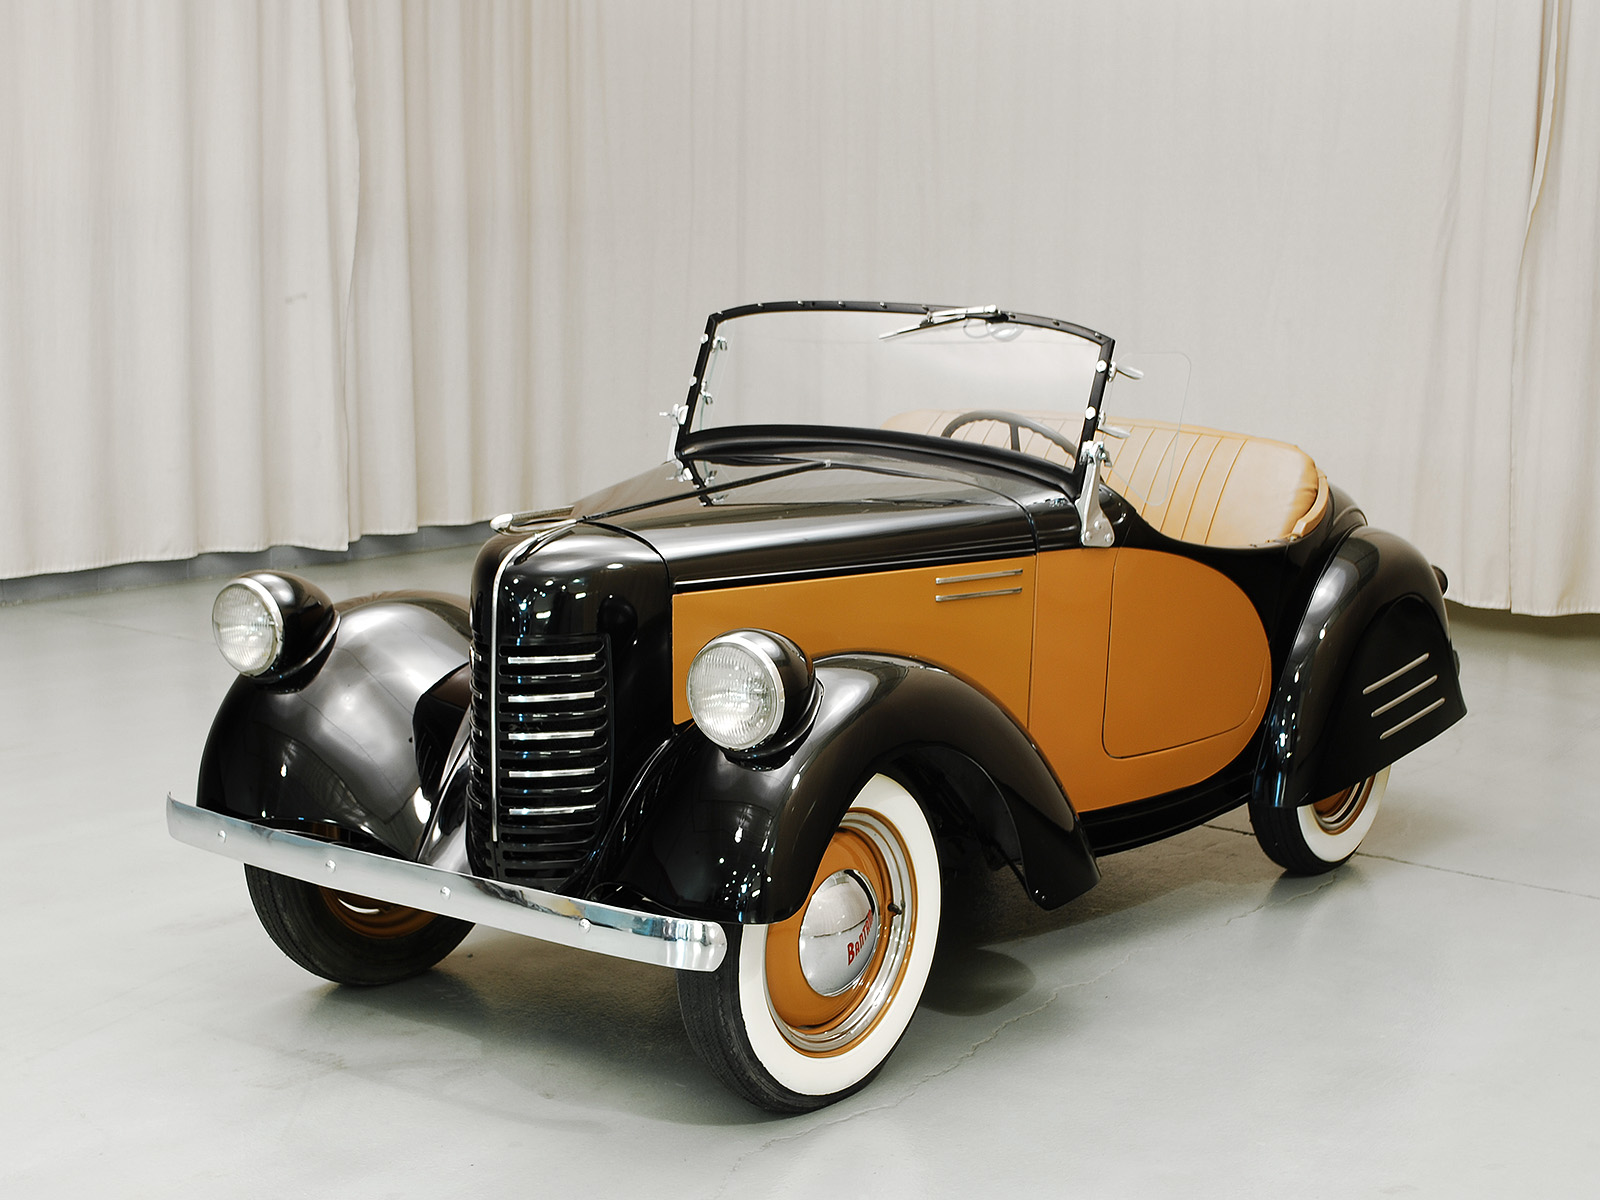 Cars Under 6000 >> 1940 American Bantam Roadster | Hyman Ltd. Classic Cars